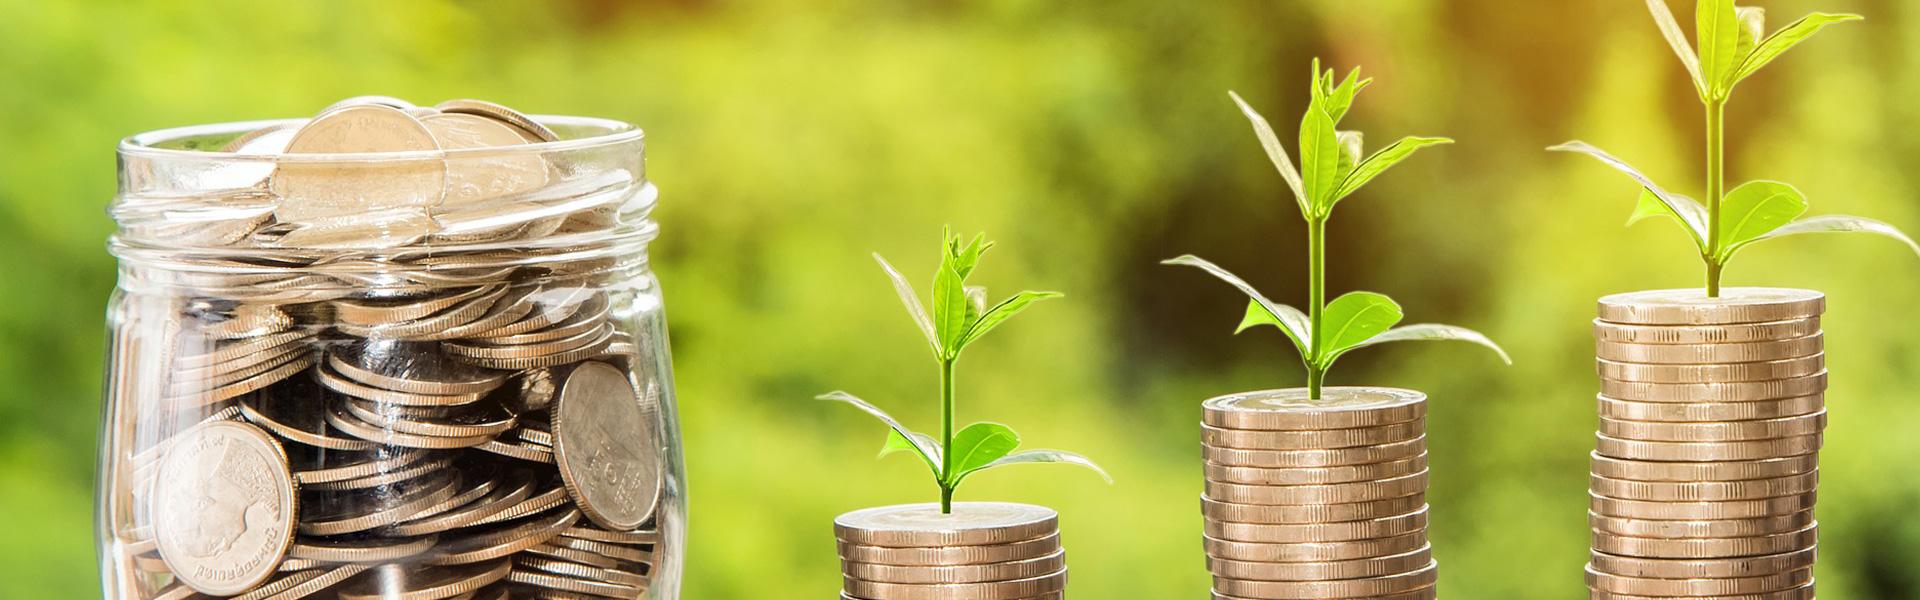 webinars green economy